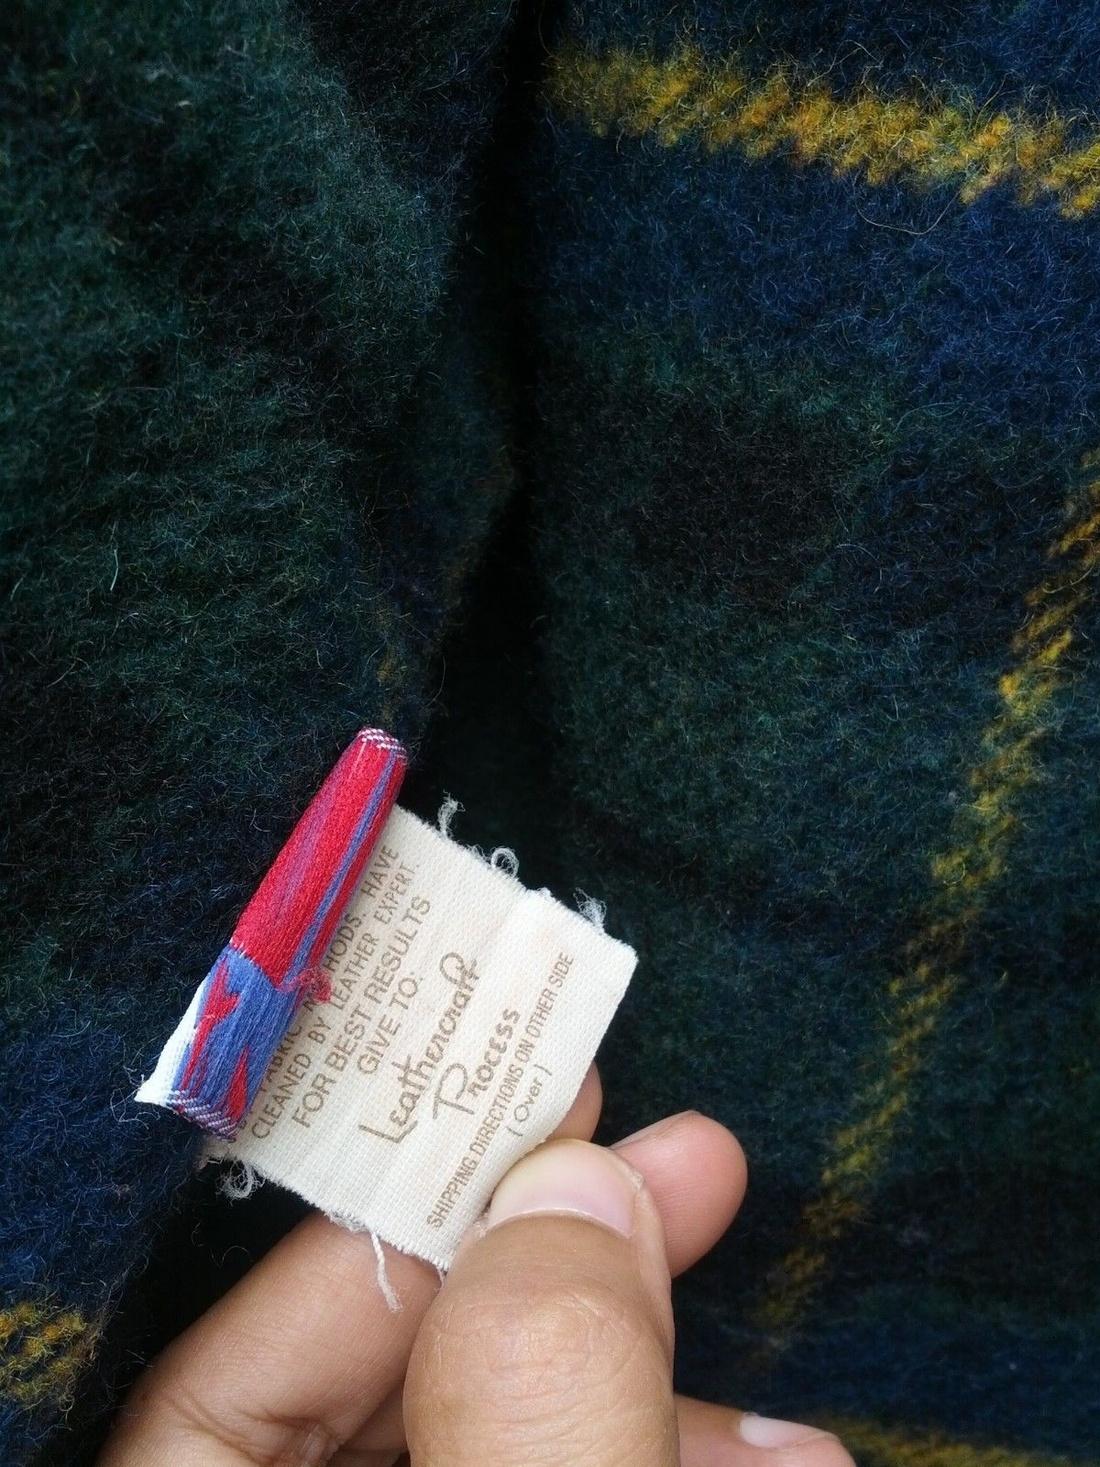 Schott SCHOTT 658 Leather Jacket Size US S / EU 44-46 / 1 - 7